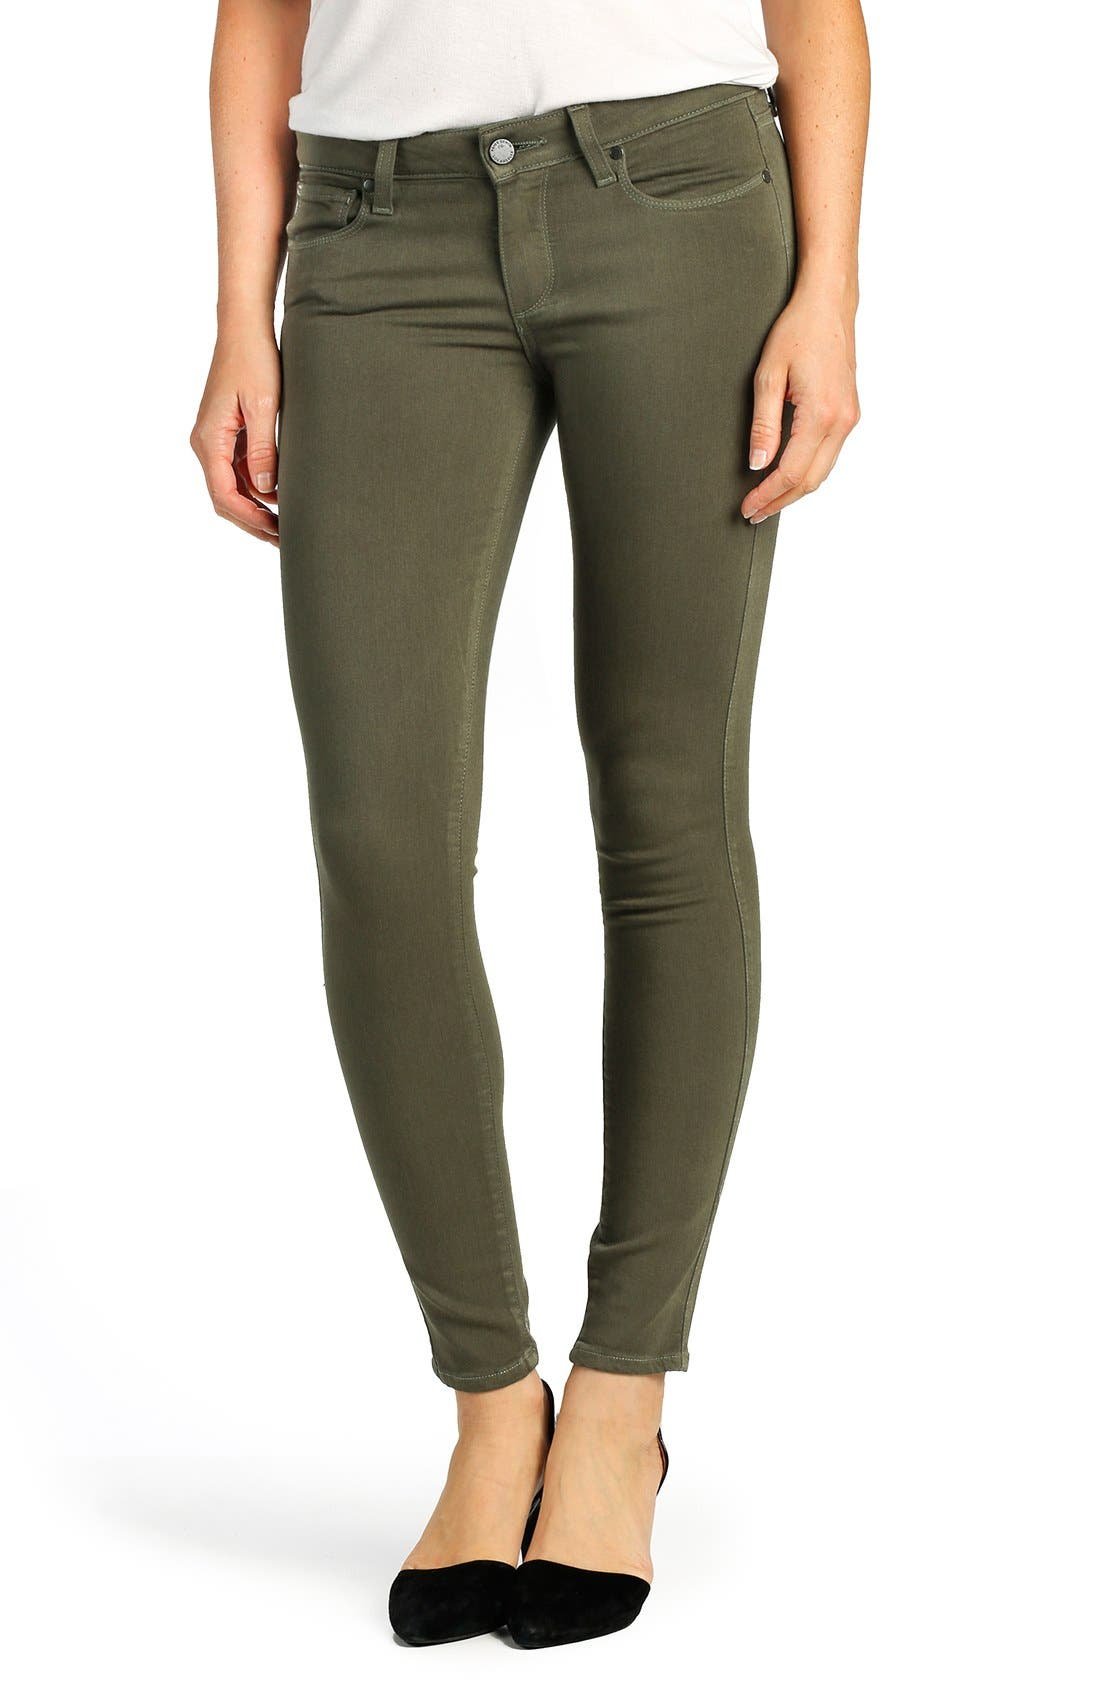 Alternate Image 1 Selected - PAIGE 'Transcend - Verdugo' Ankle Ultra Skinny Jeans (Desert Olive)